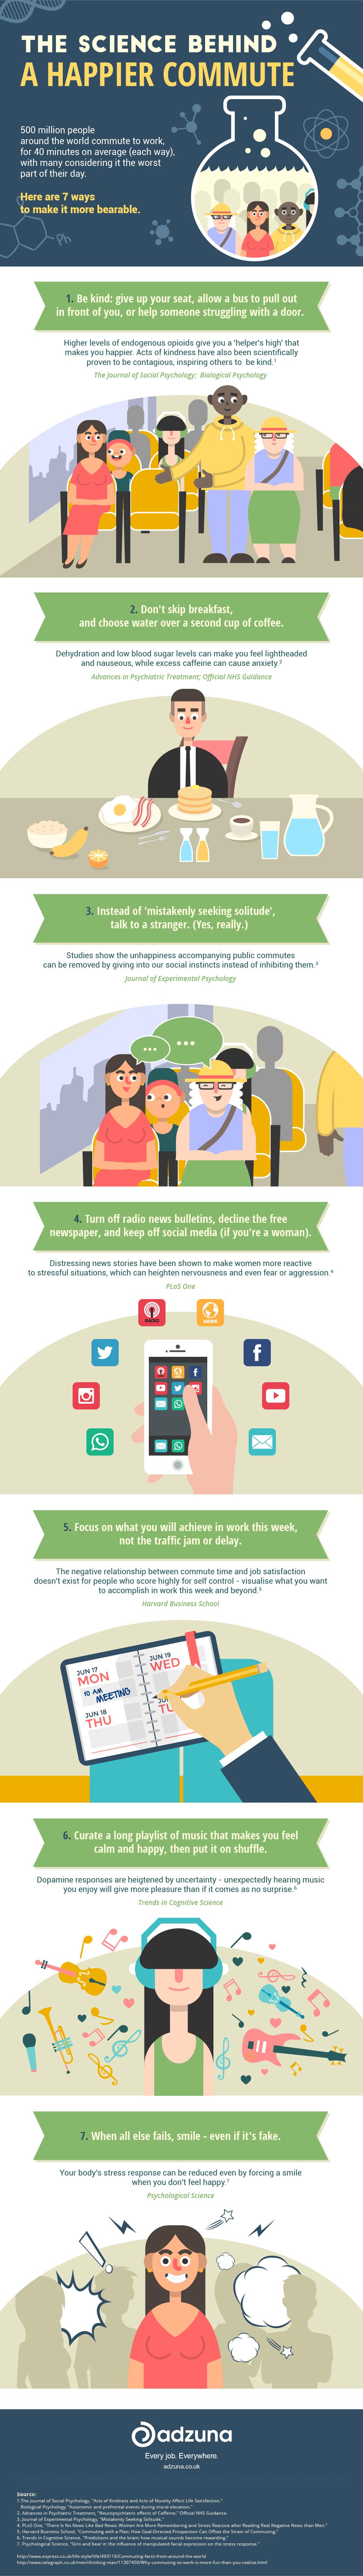 Happier Commute infographic